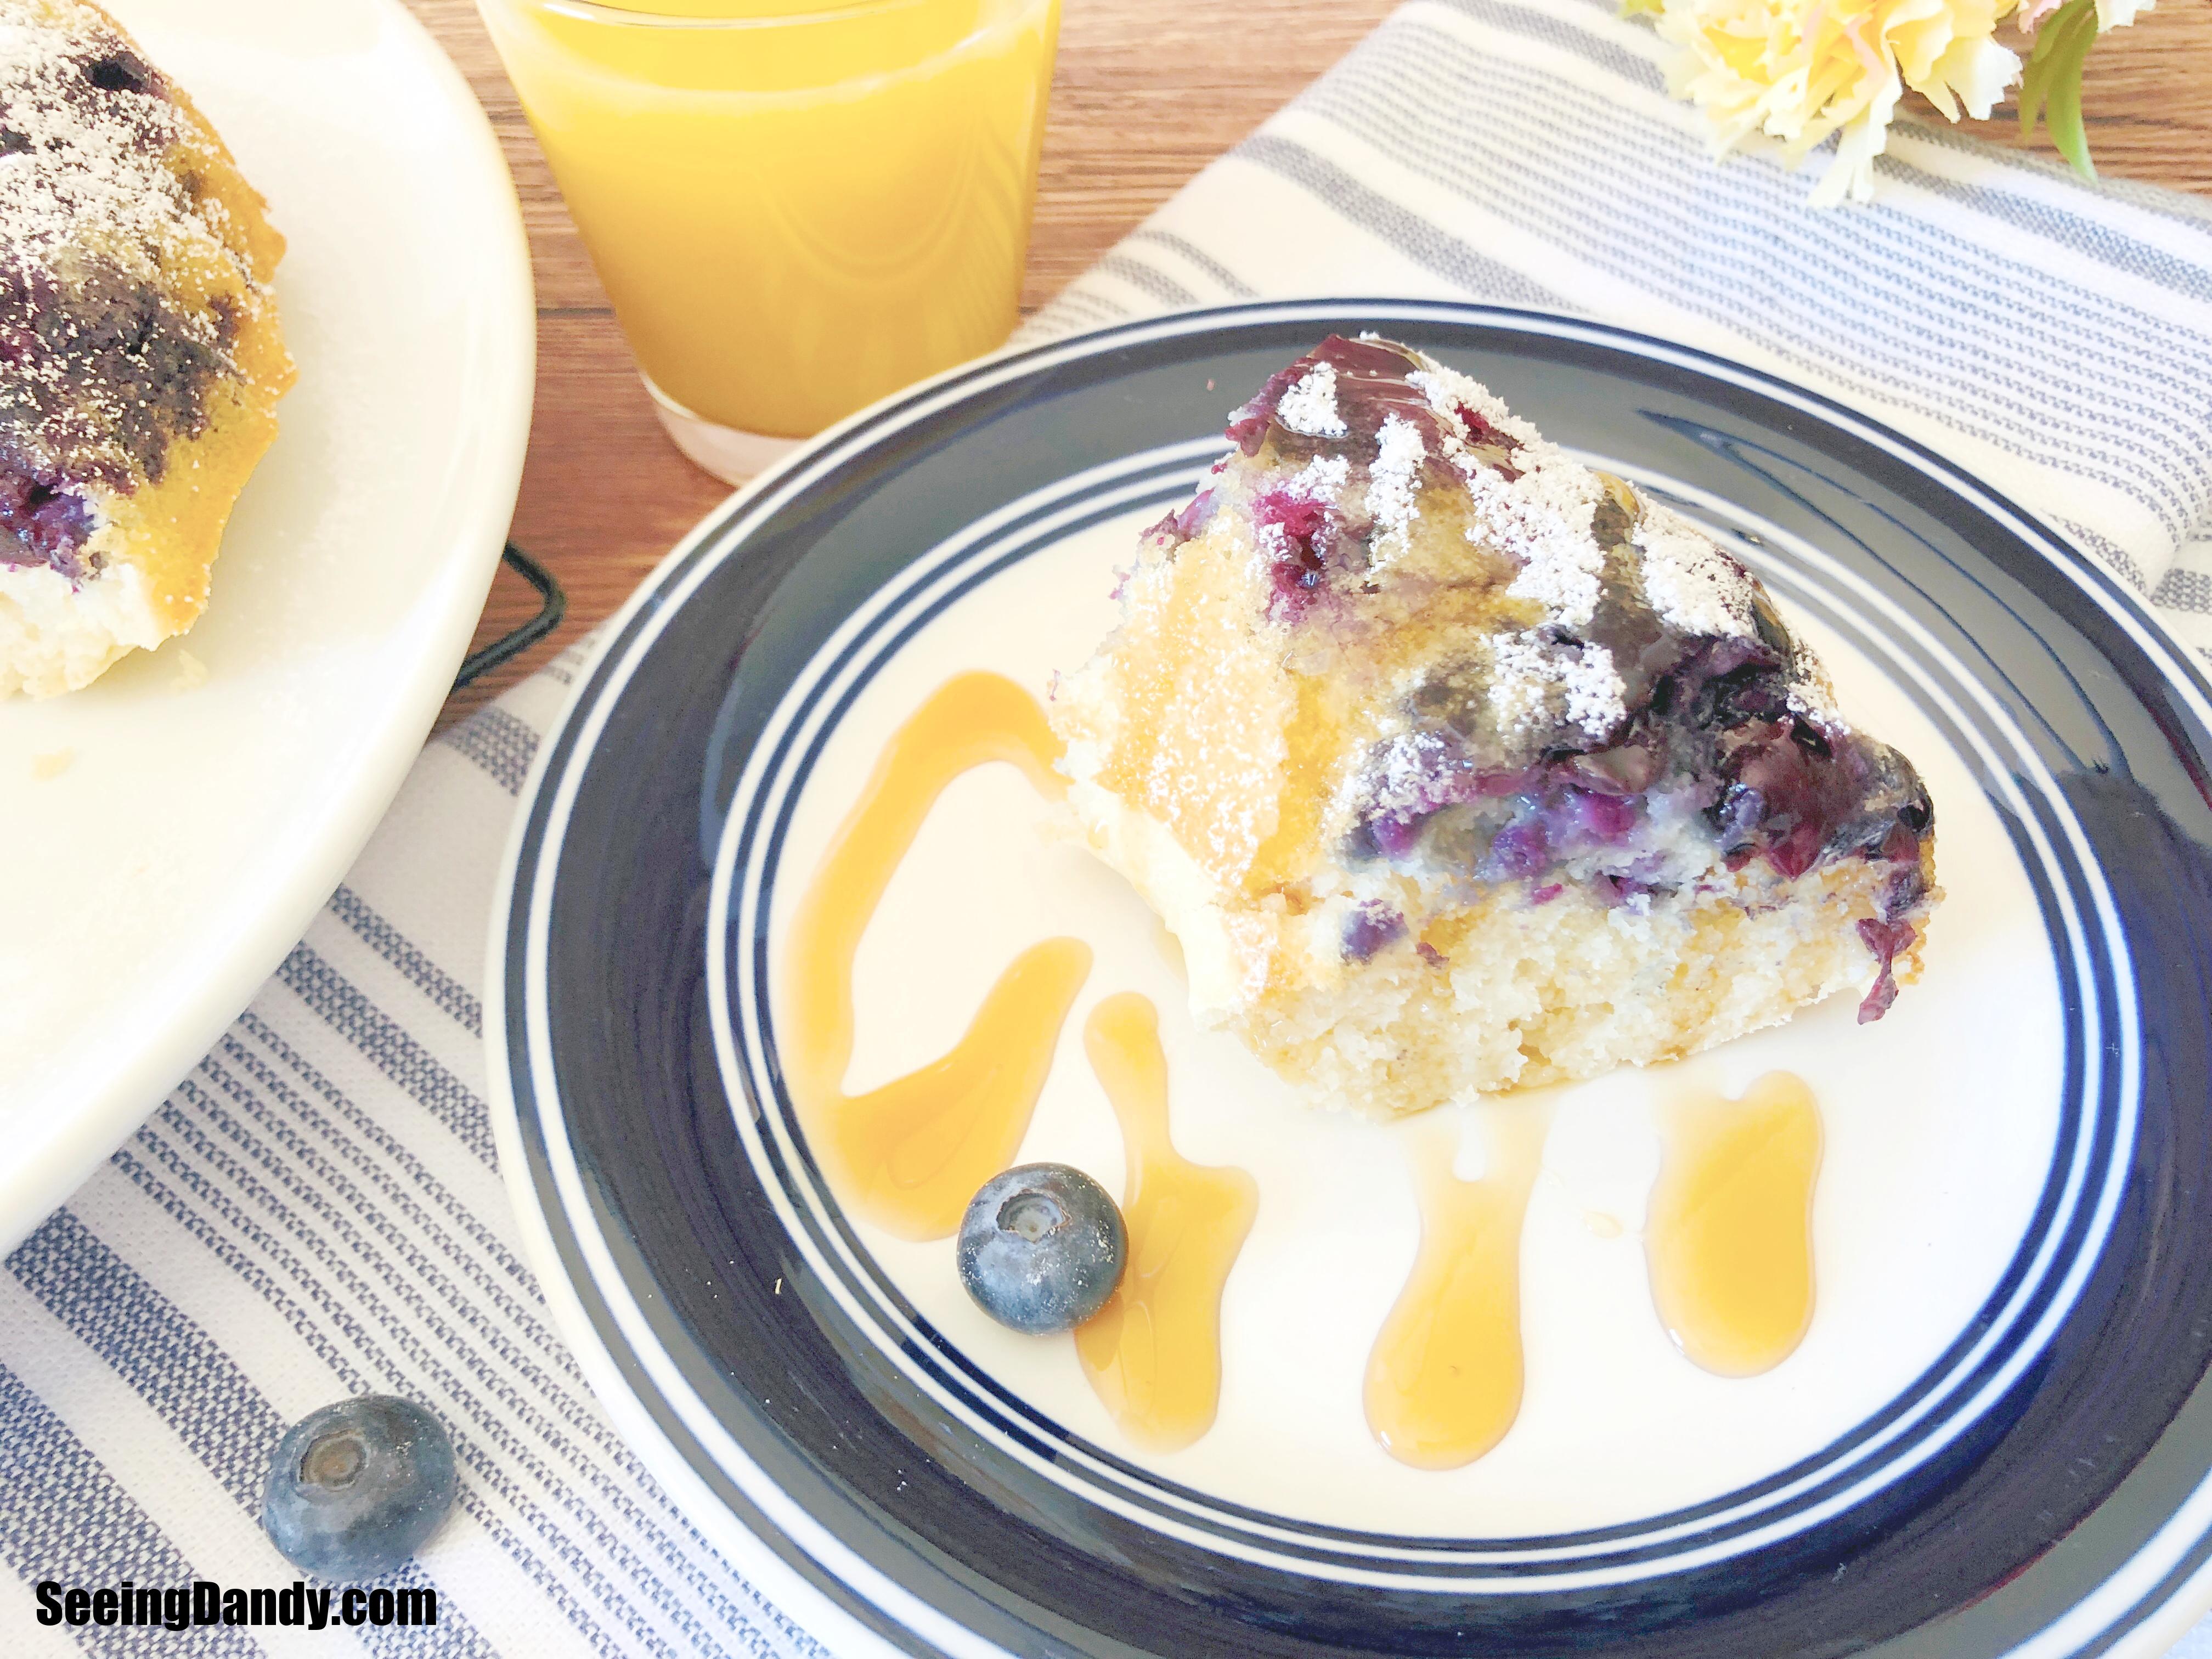 blueberry pancake bundt cake recipe, dessert recipes, mothers day, brunch recipes, cake recipes, bundt cake recipes, farmhouse napkins, farmhouse style dish towel, orange juice, breakfast recipes